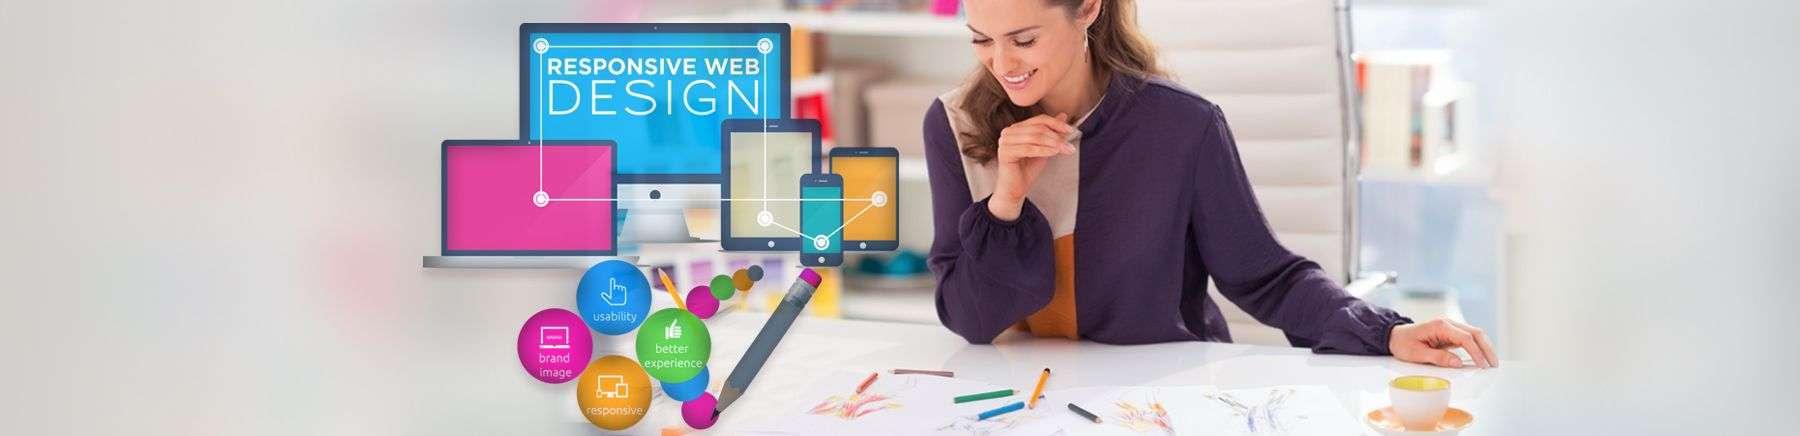 web-design-compressed